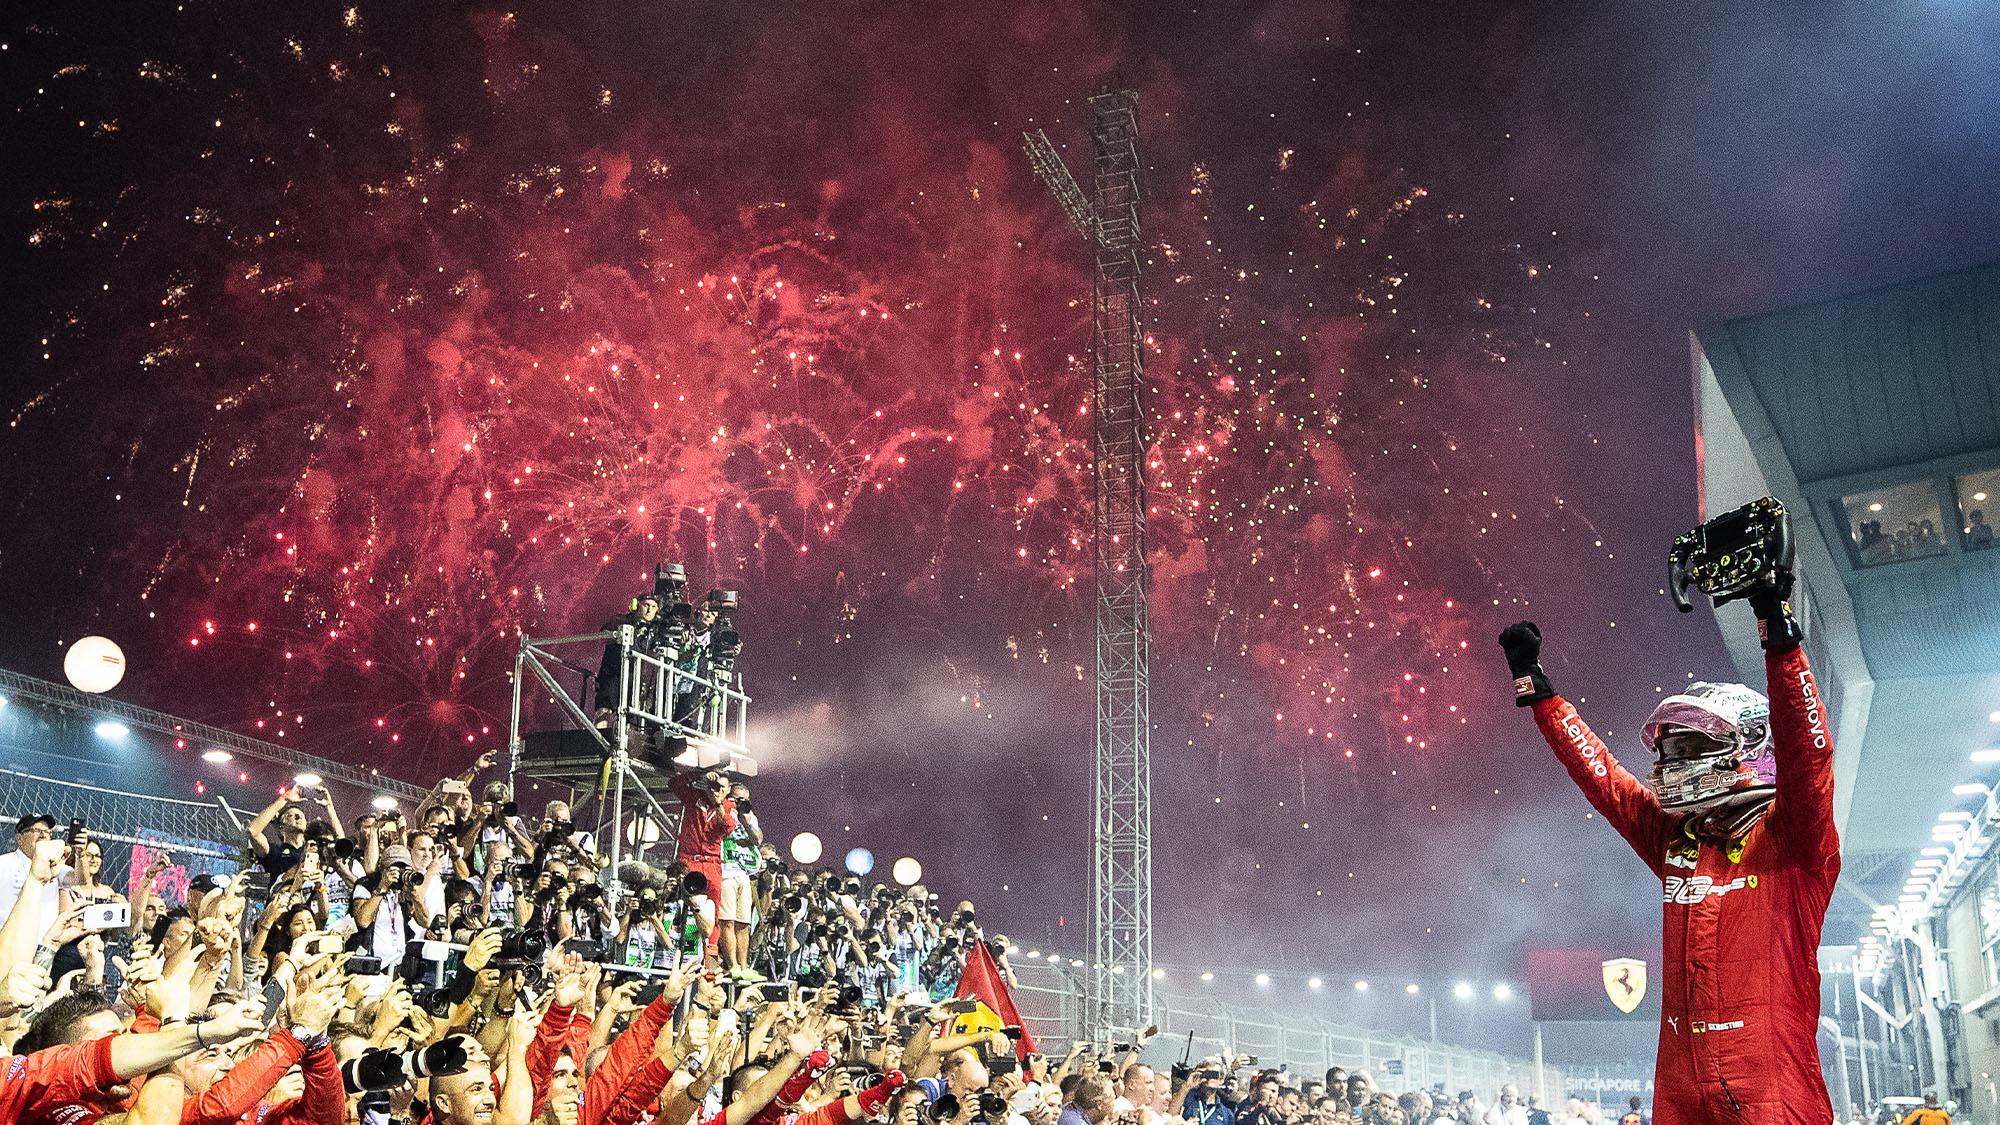 Sebastian Vettel celebrates victory in the 2019 Singapore GP with fireworks